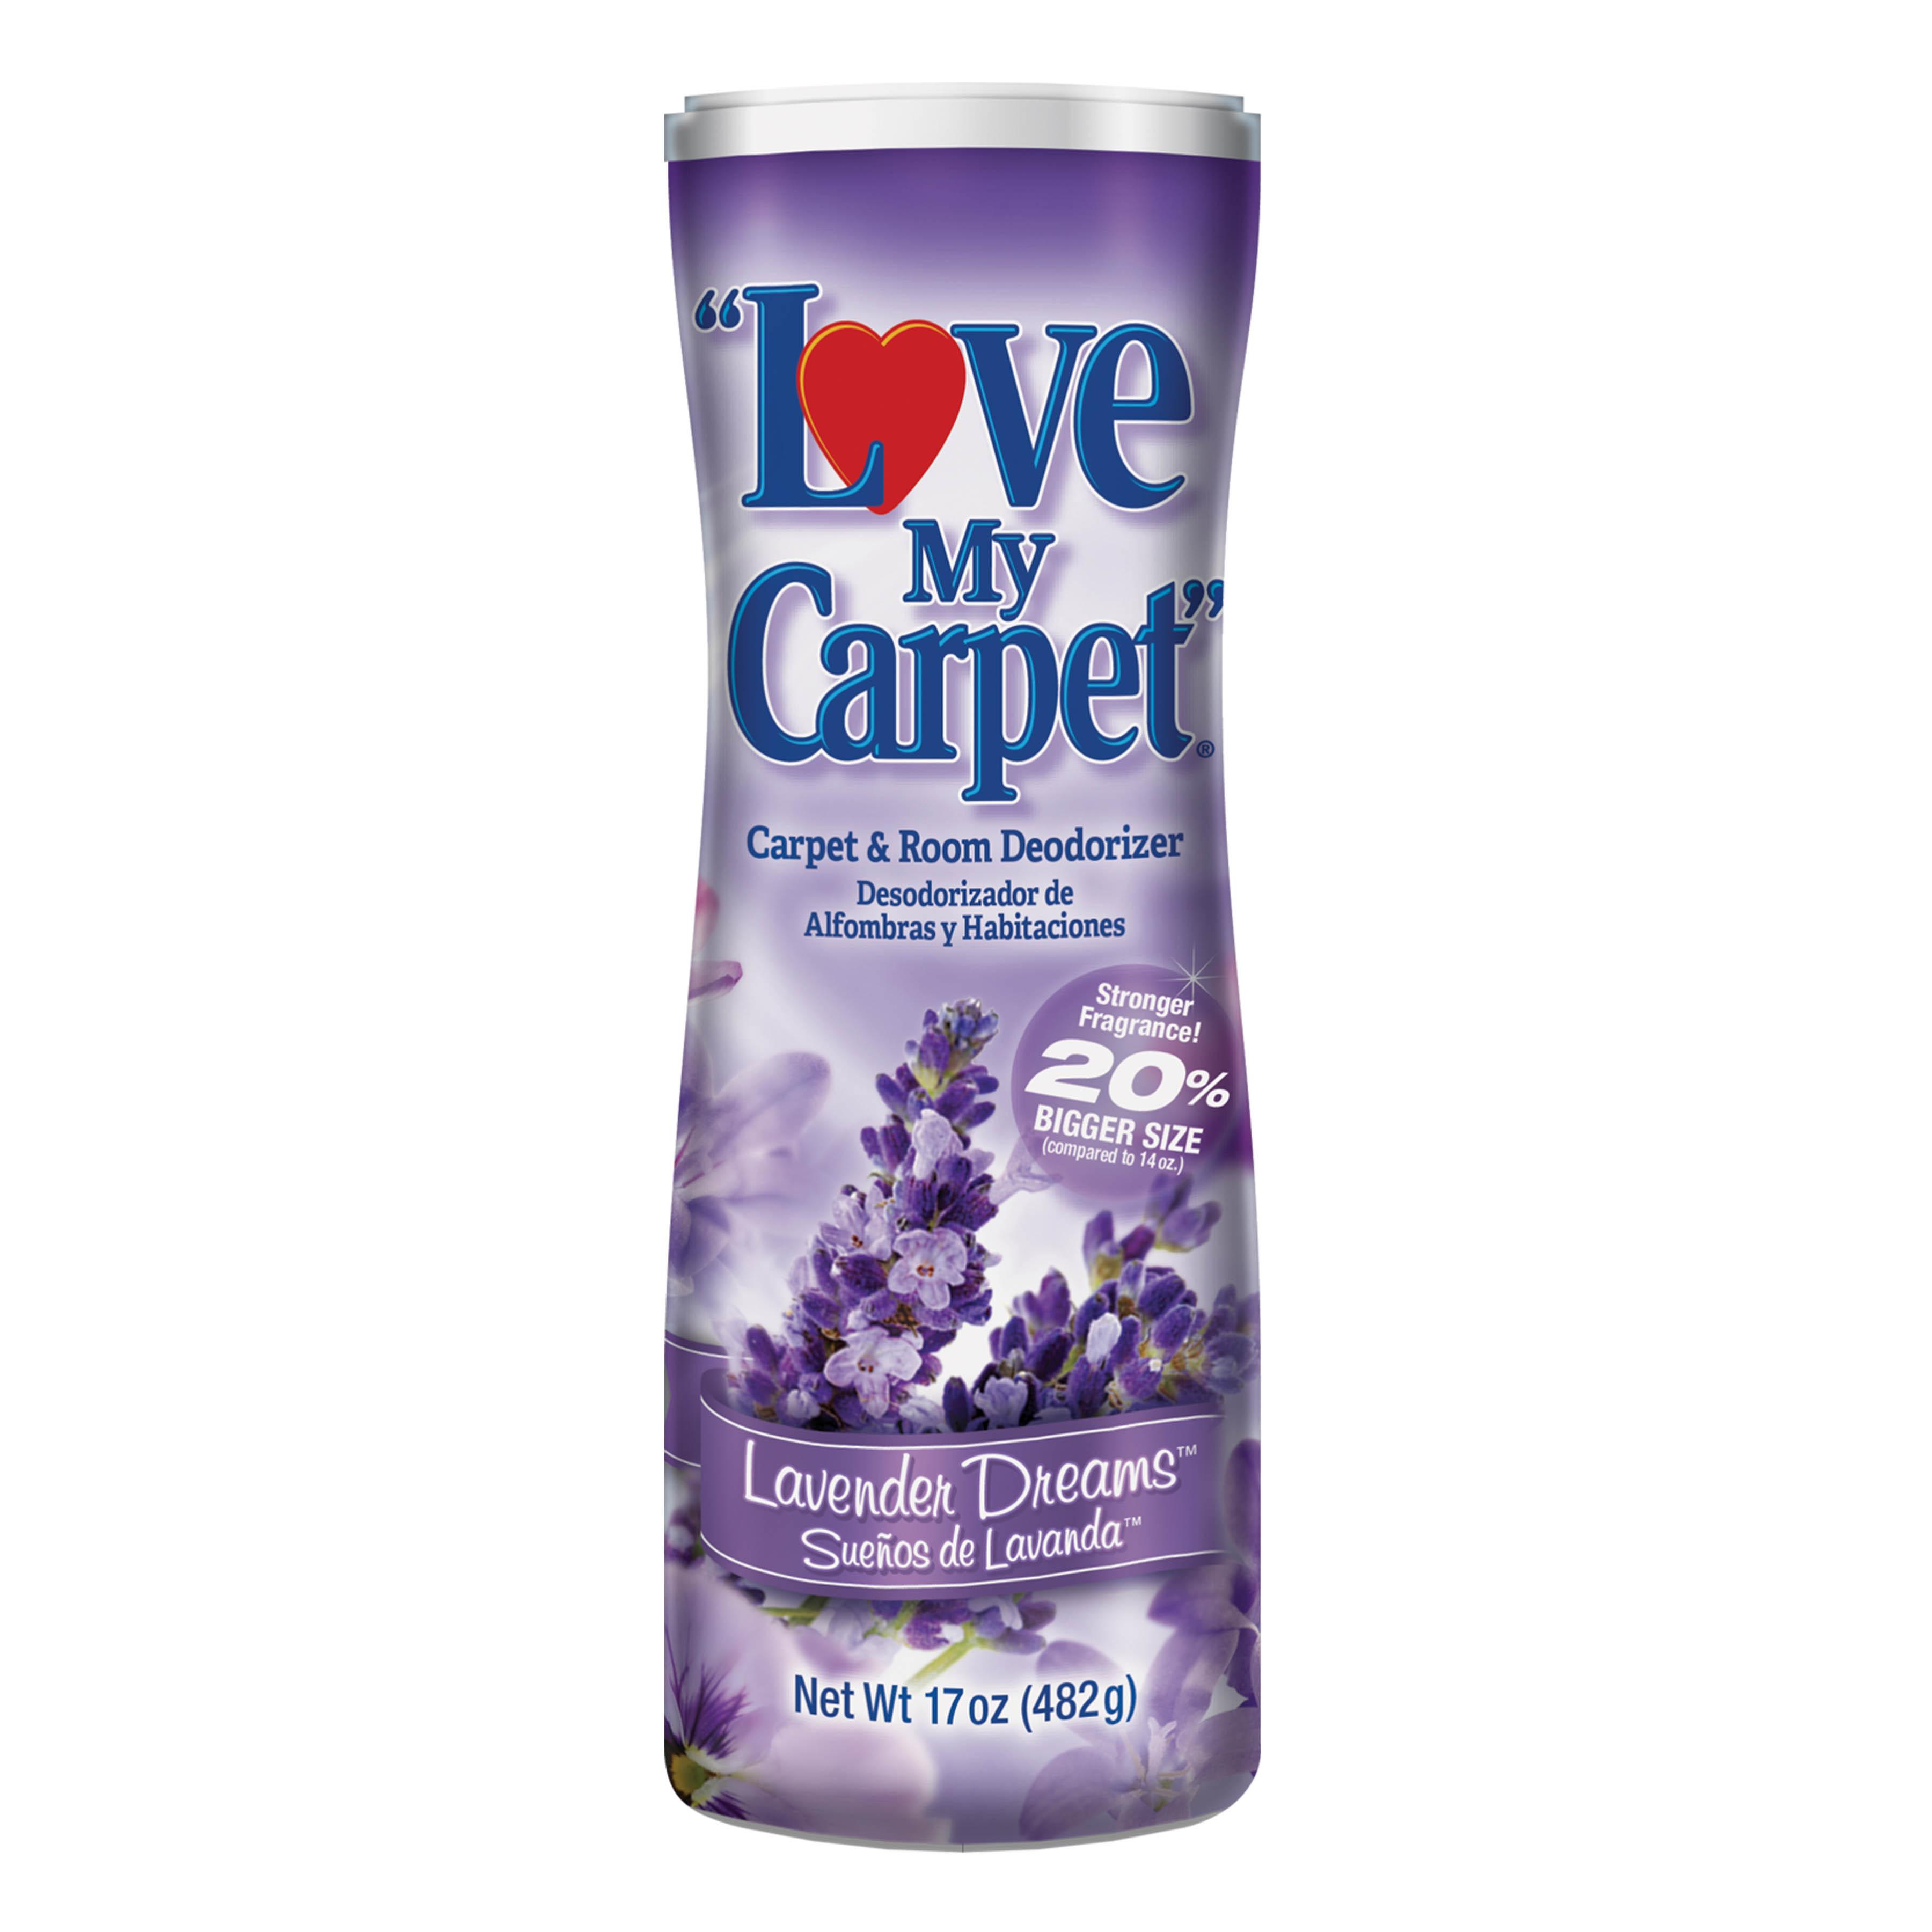 Love My Carpet, Lavender Dreams